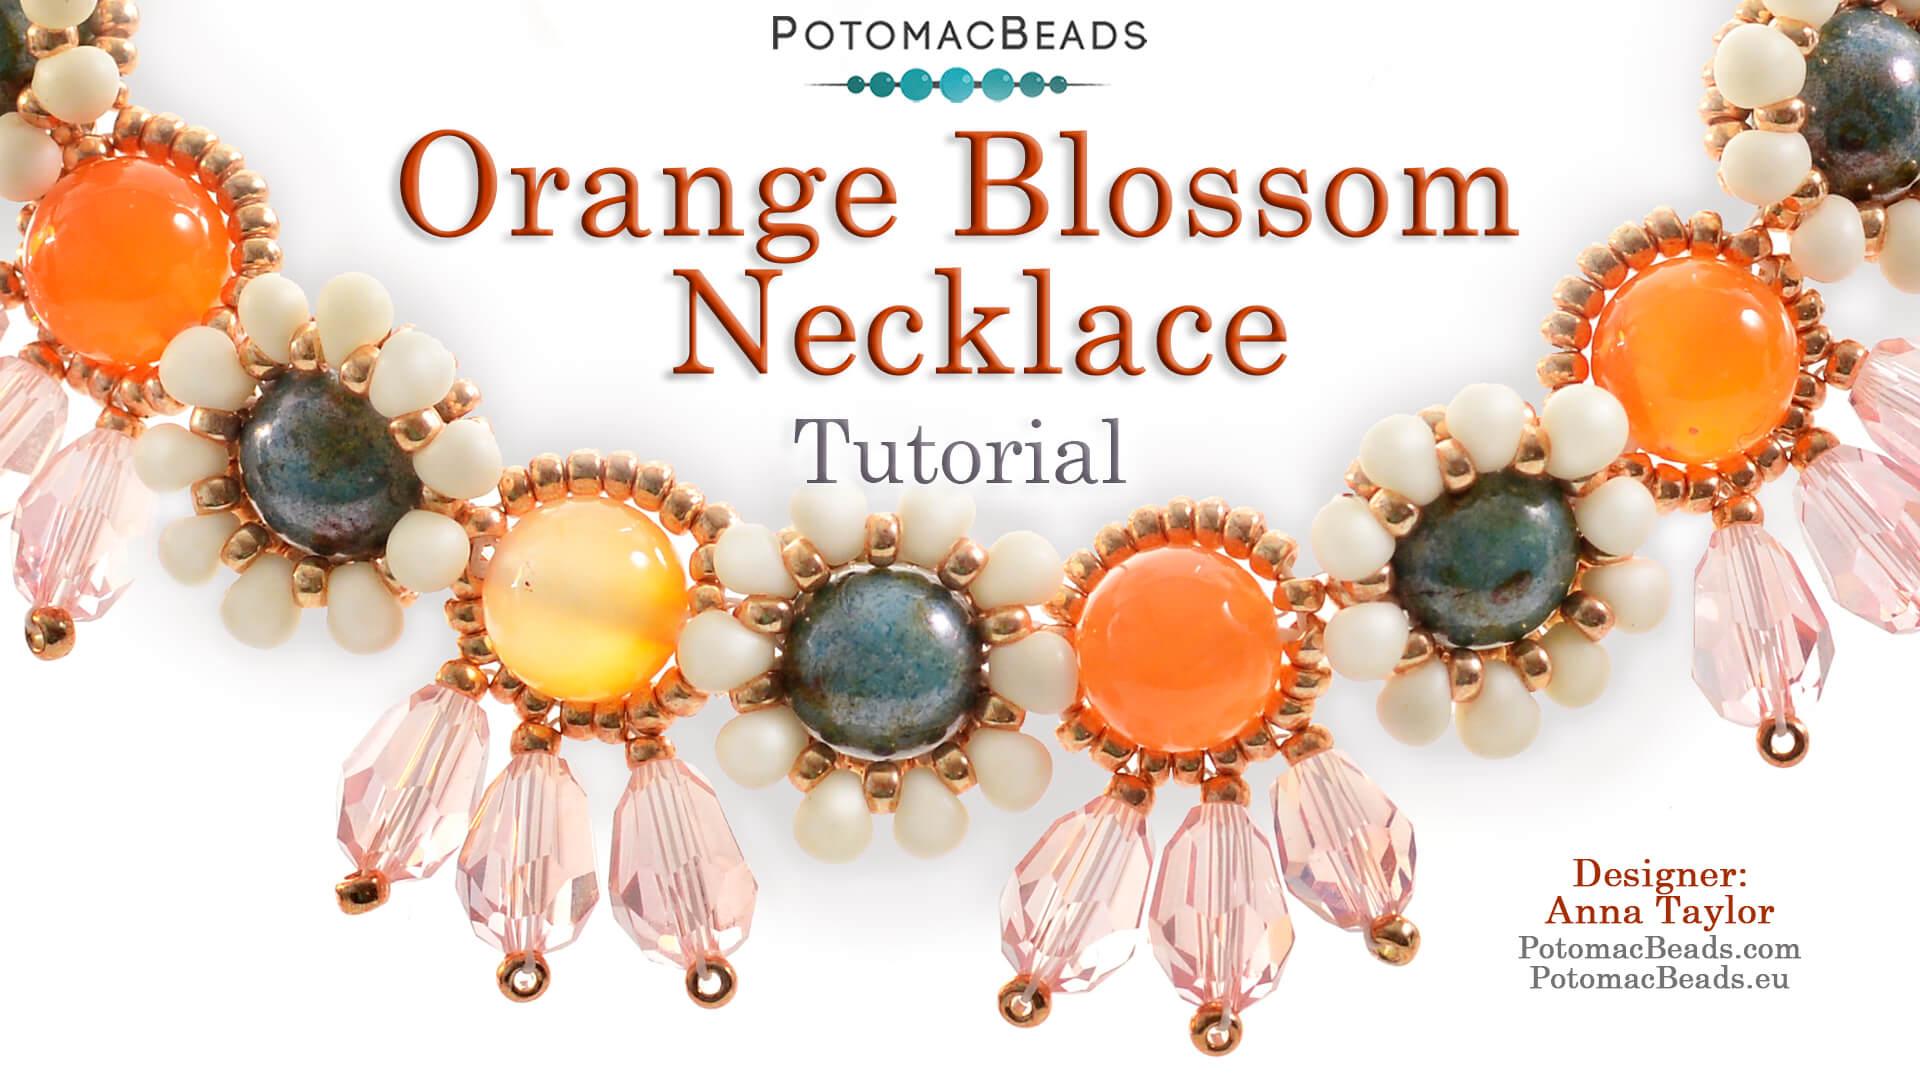 How to Bead Jewelry / Beading Tutorials & Jewel Making Videos / Bead Weaving Tutorials & Necklace Tutorial / Orange Blossom Necklace Tutorial